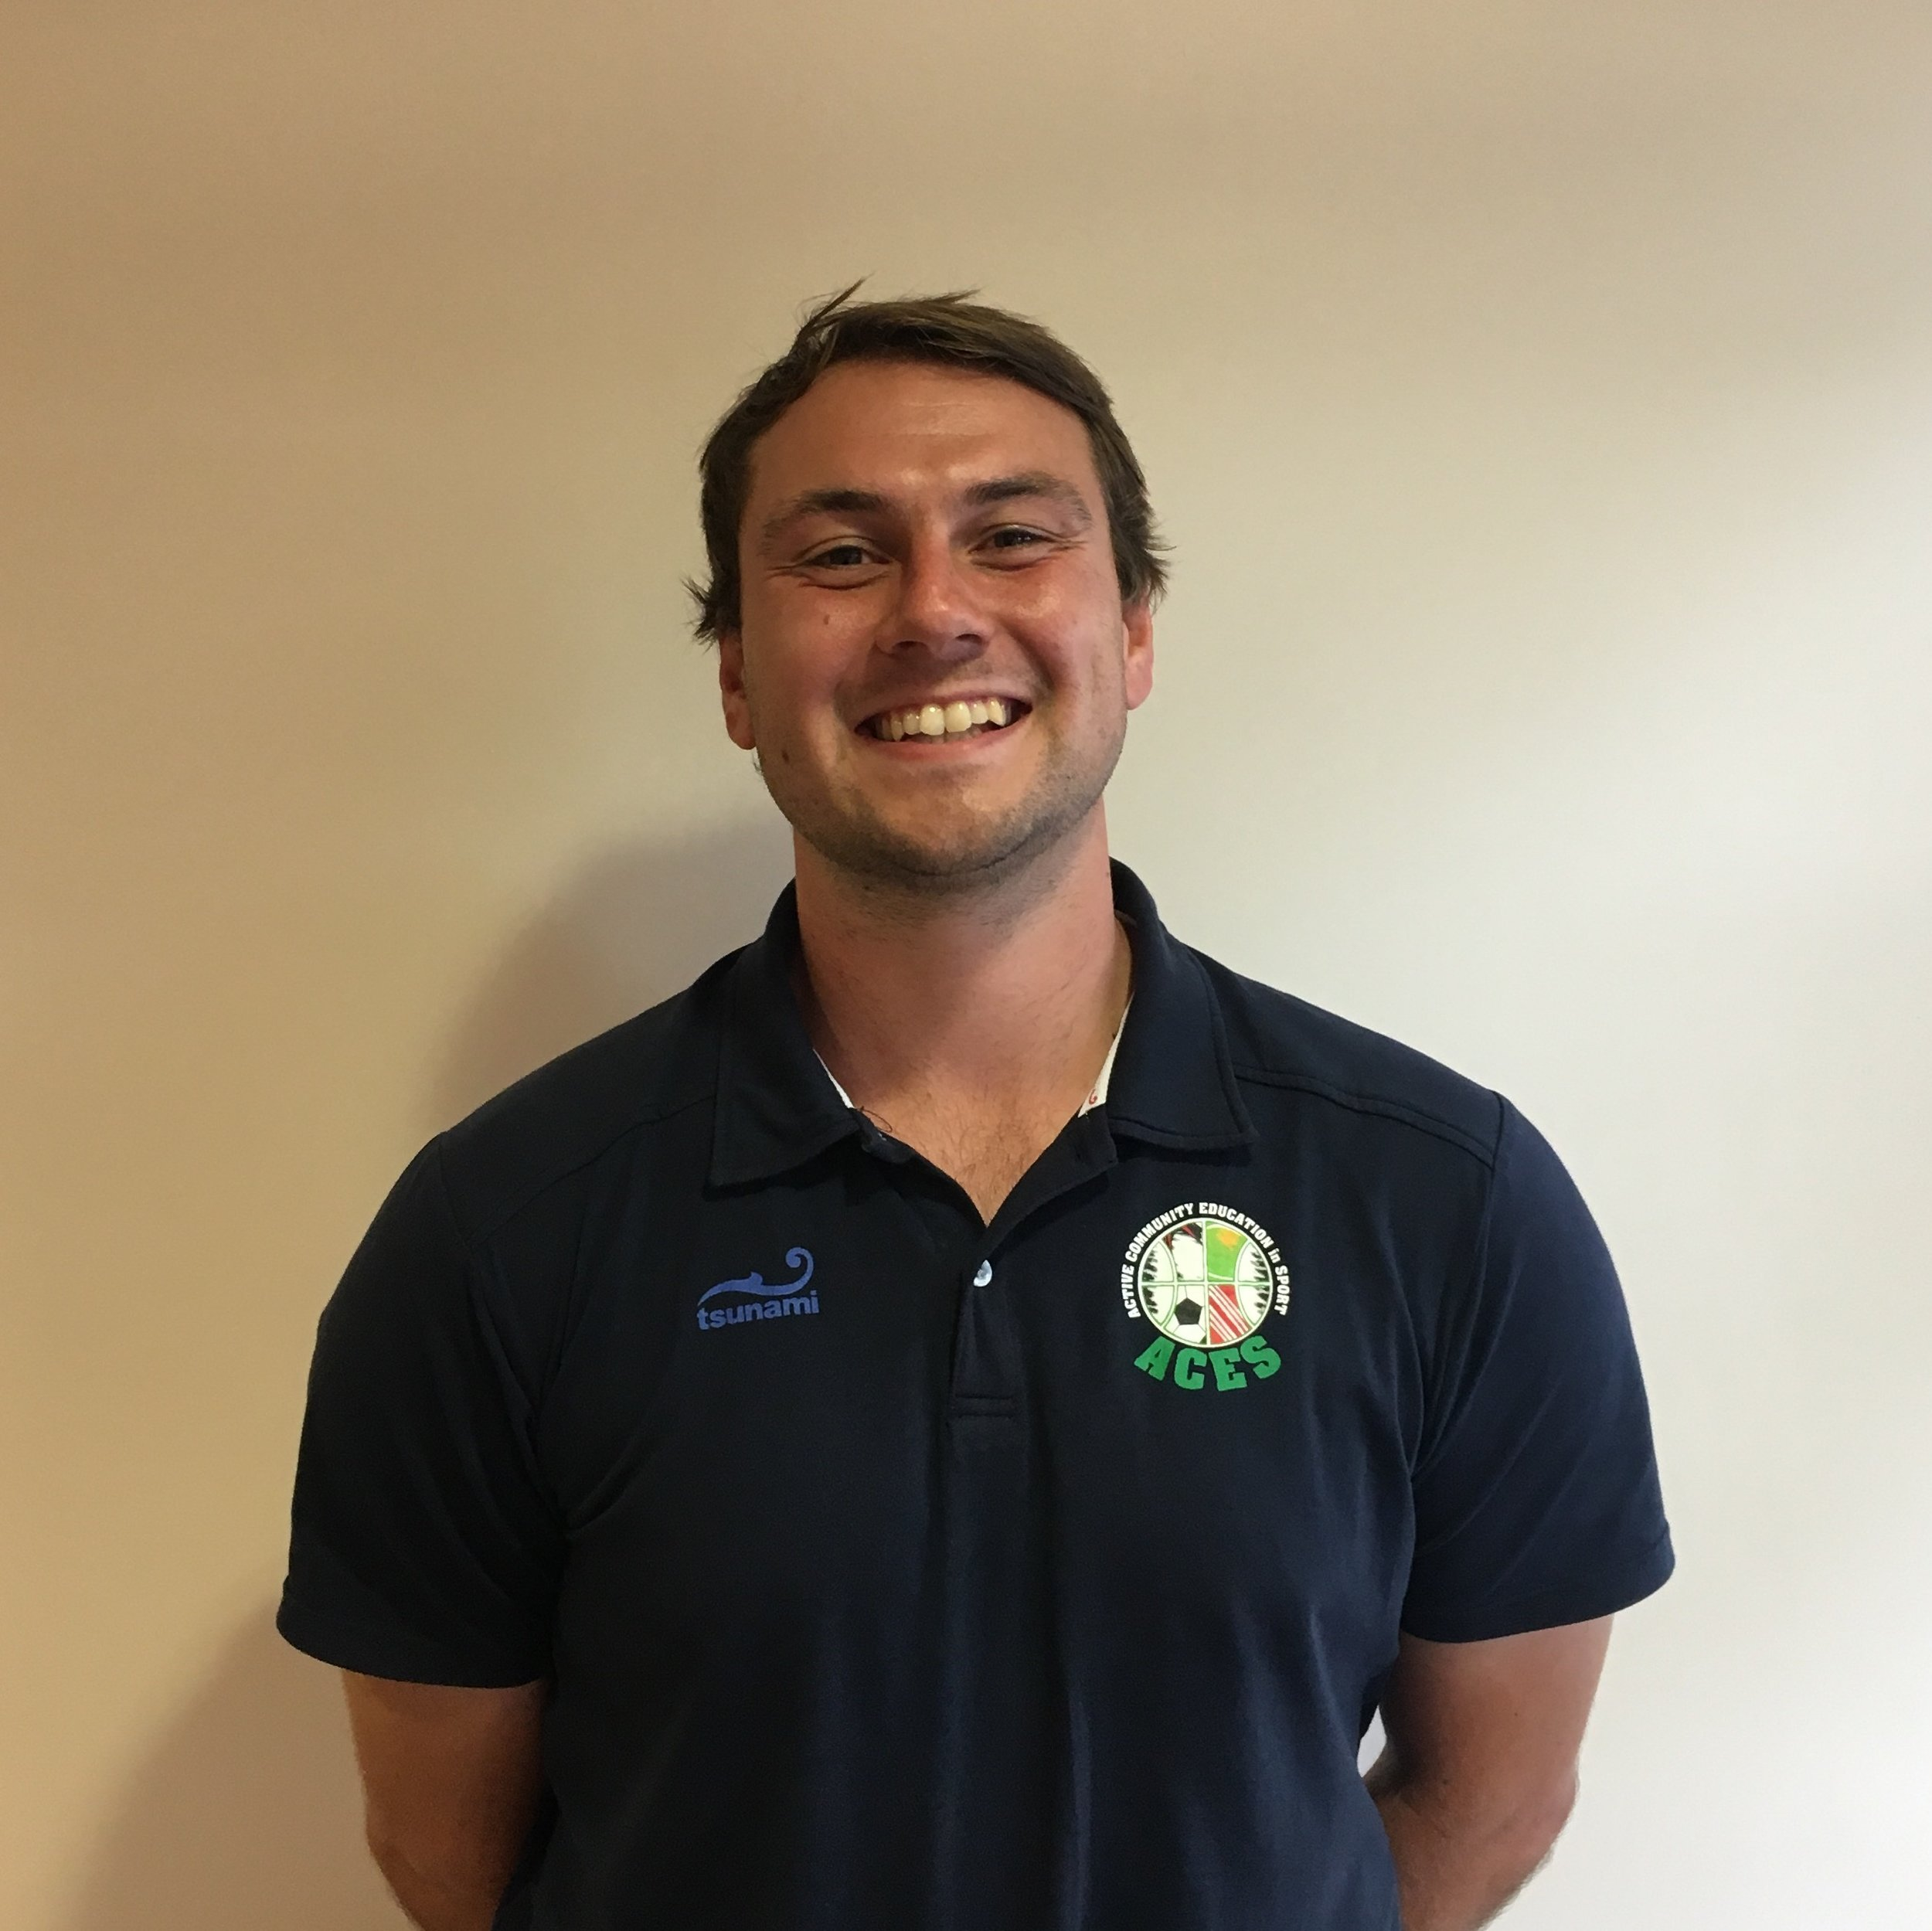 Matthew Broadbent    Sports Educator.     Qualifications:   Bsc MSc Sports Science, Level 2 RU, Level 1 FA.    Representative:   West Yorks u16 Crossley Health First Team.